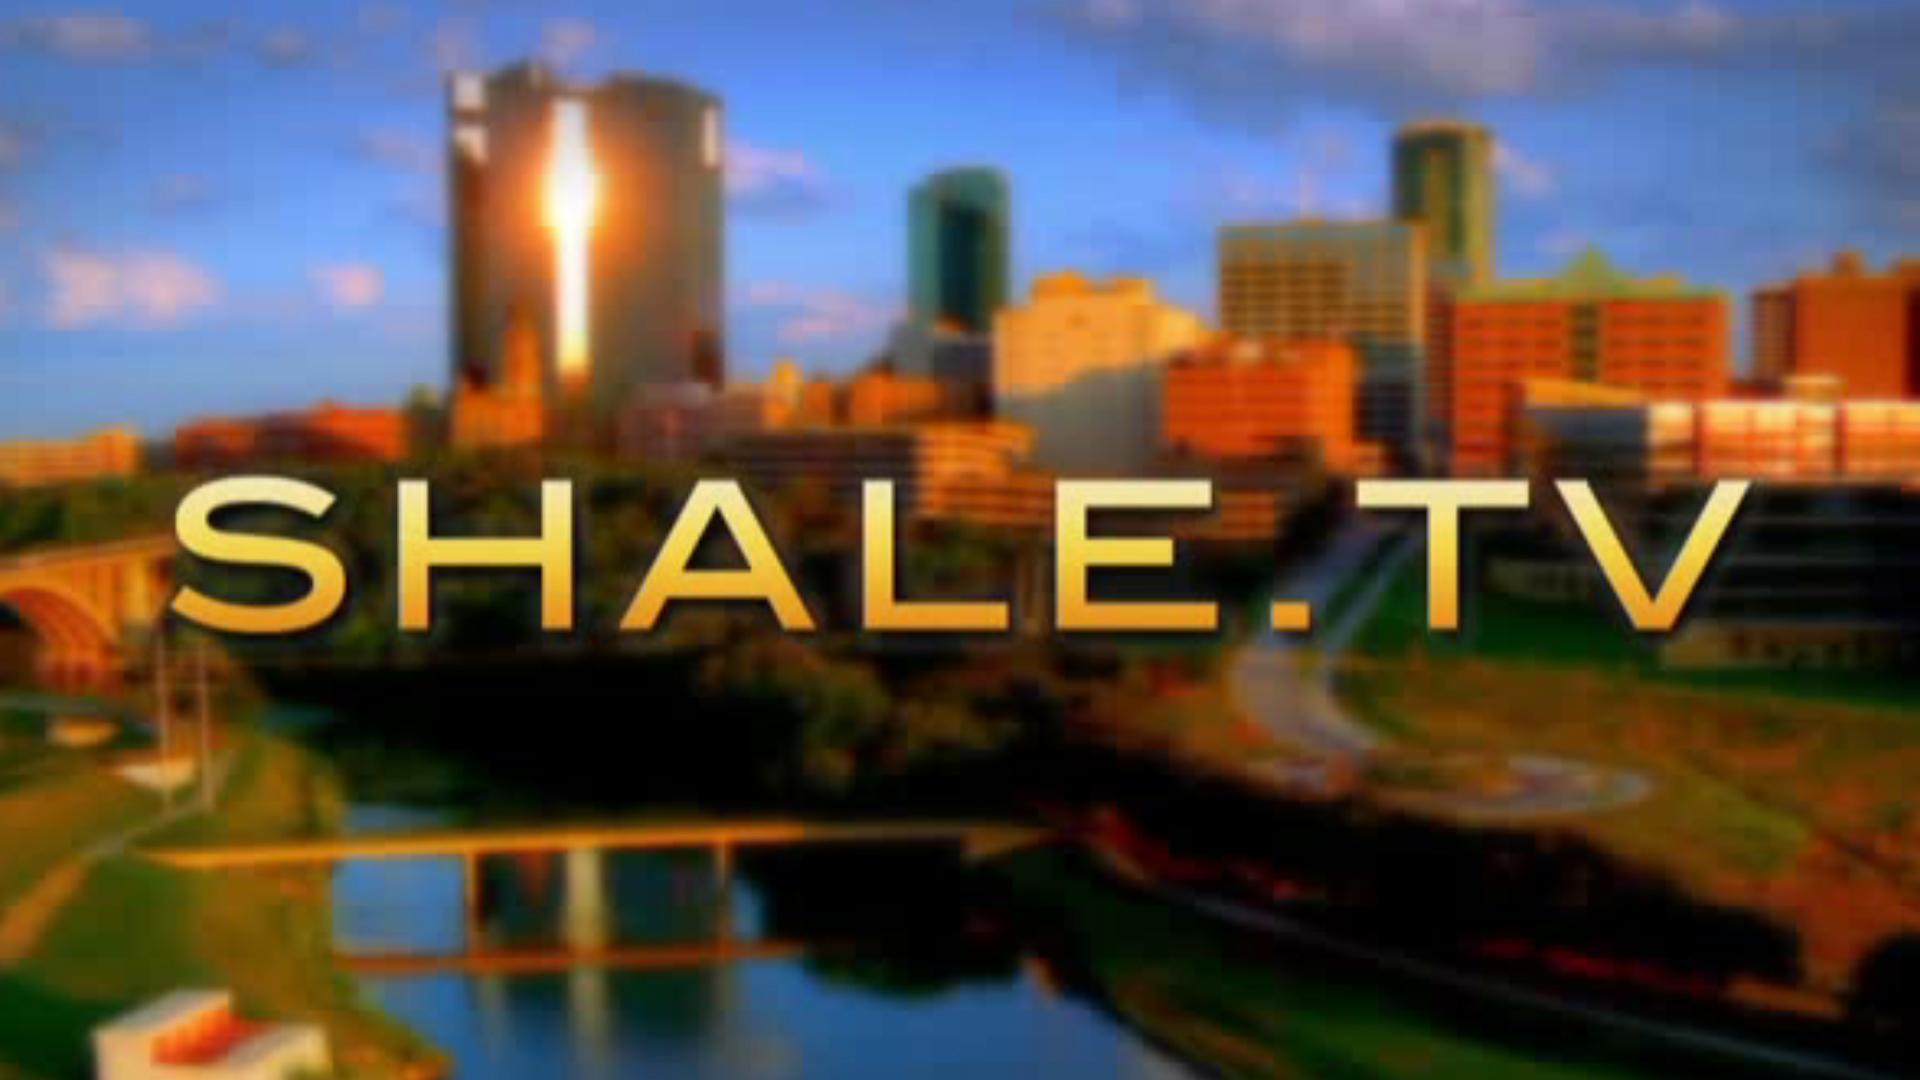 shale-tv0